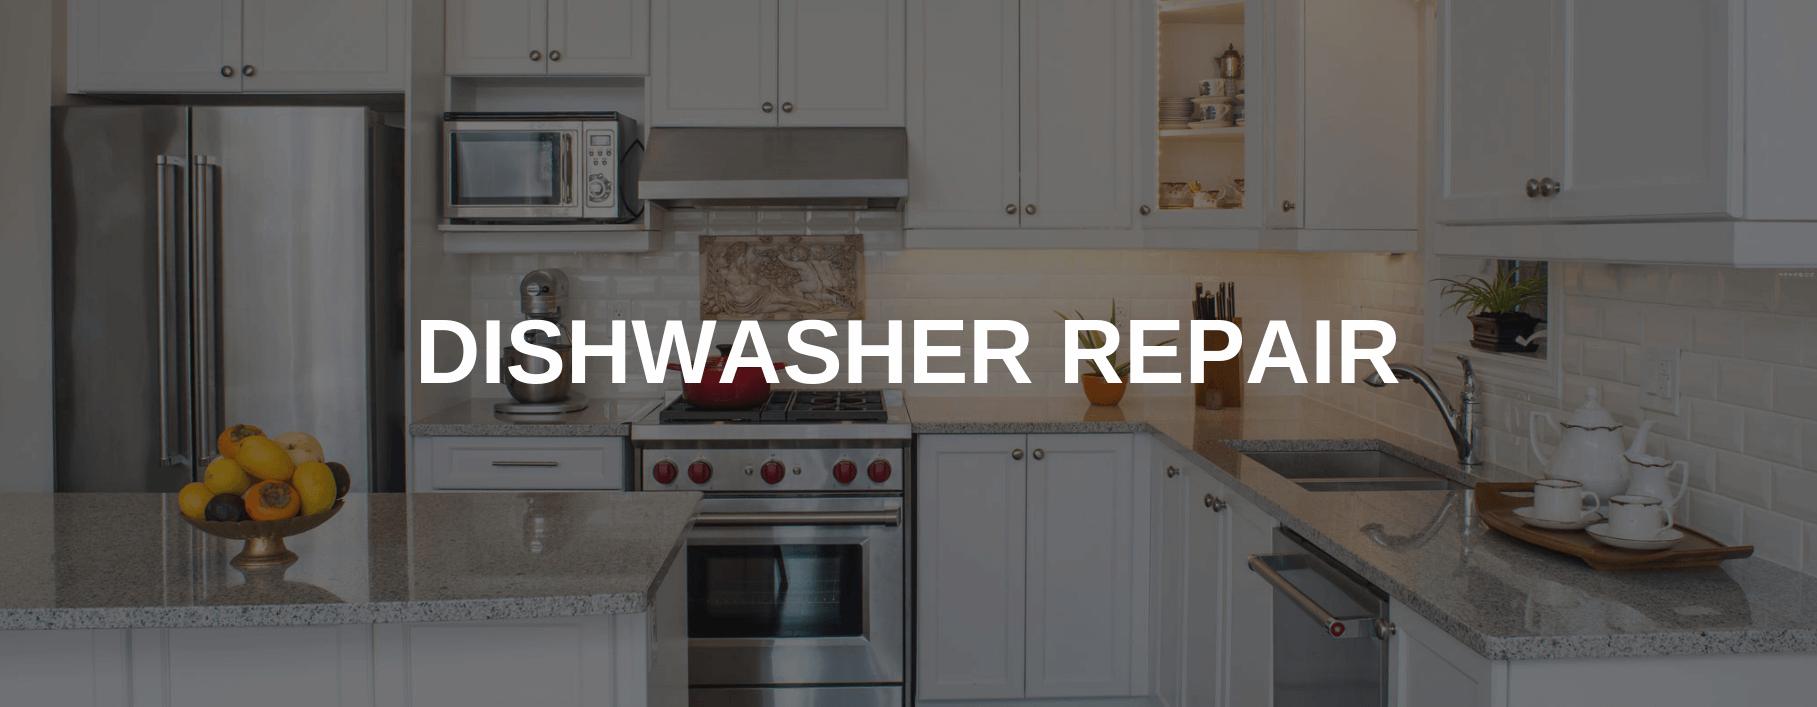 dishwasher repair spokane